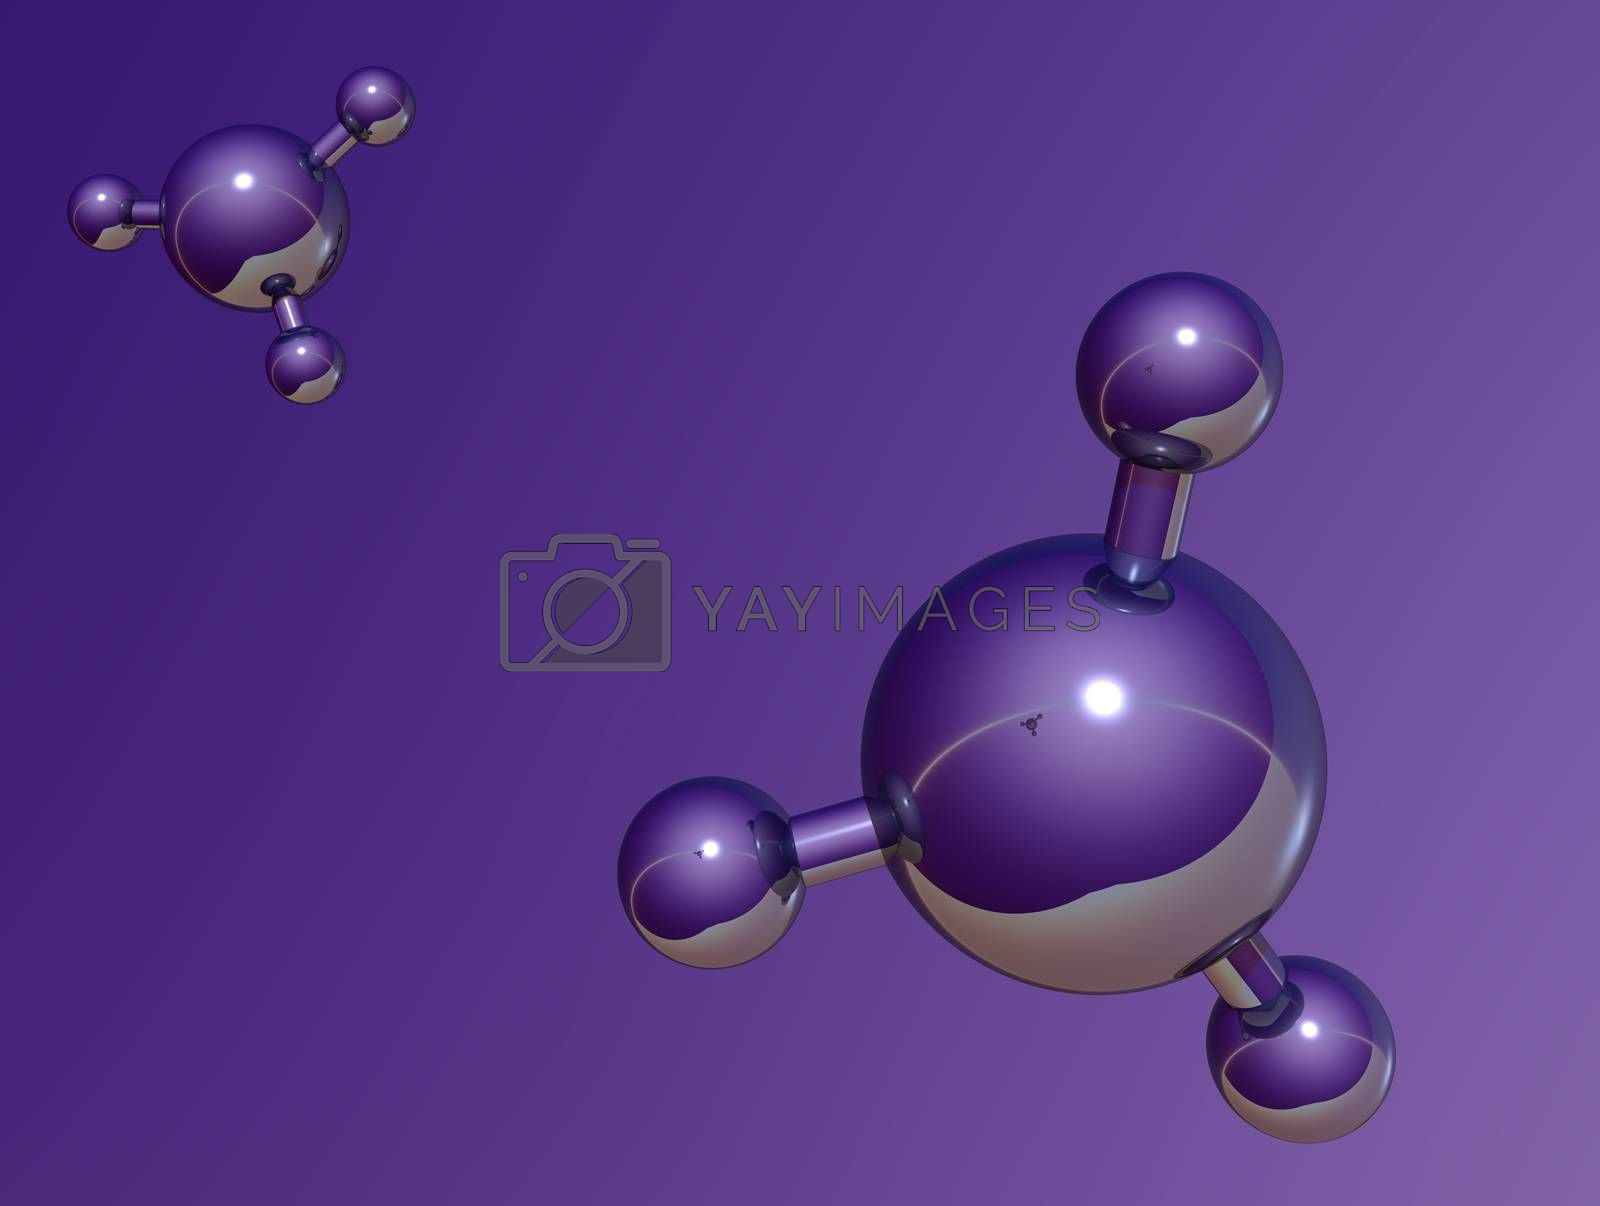 molecule model on purple background - 3d illustration